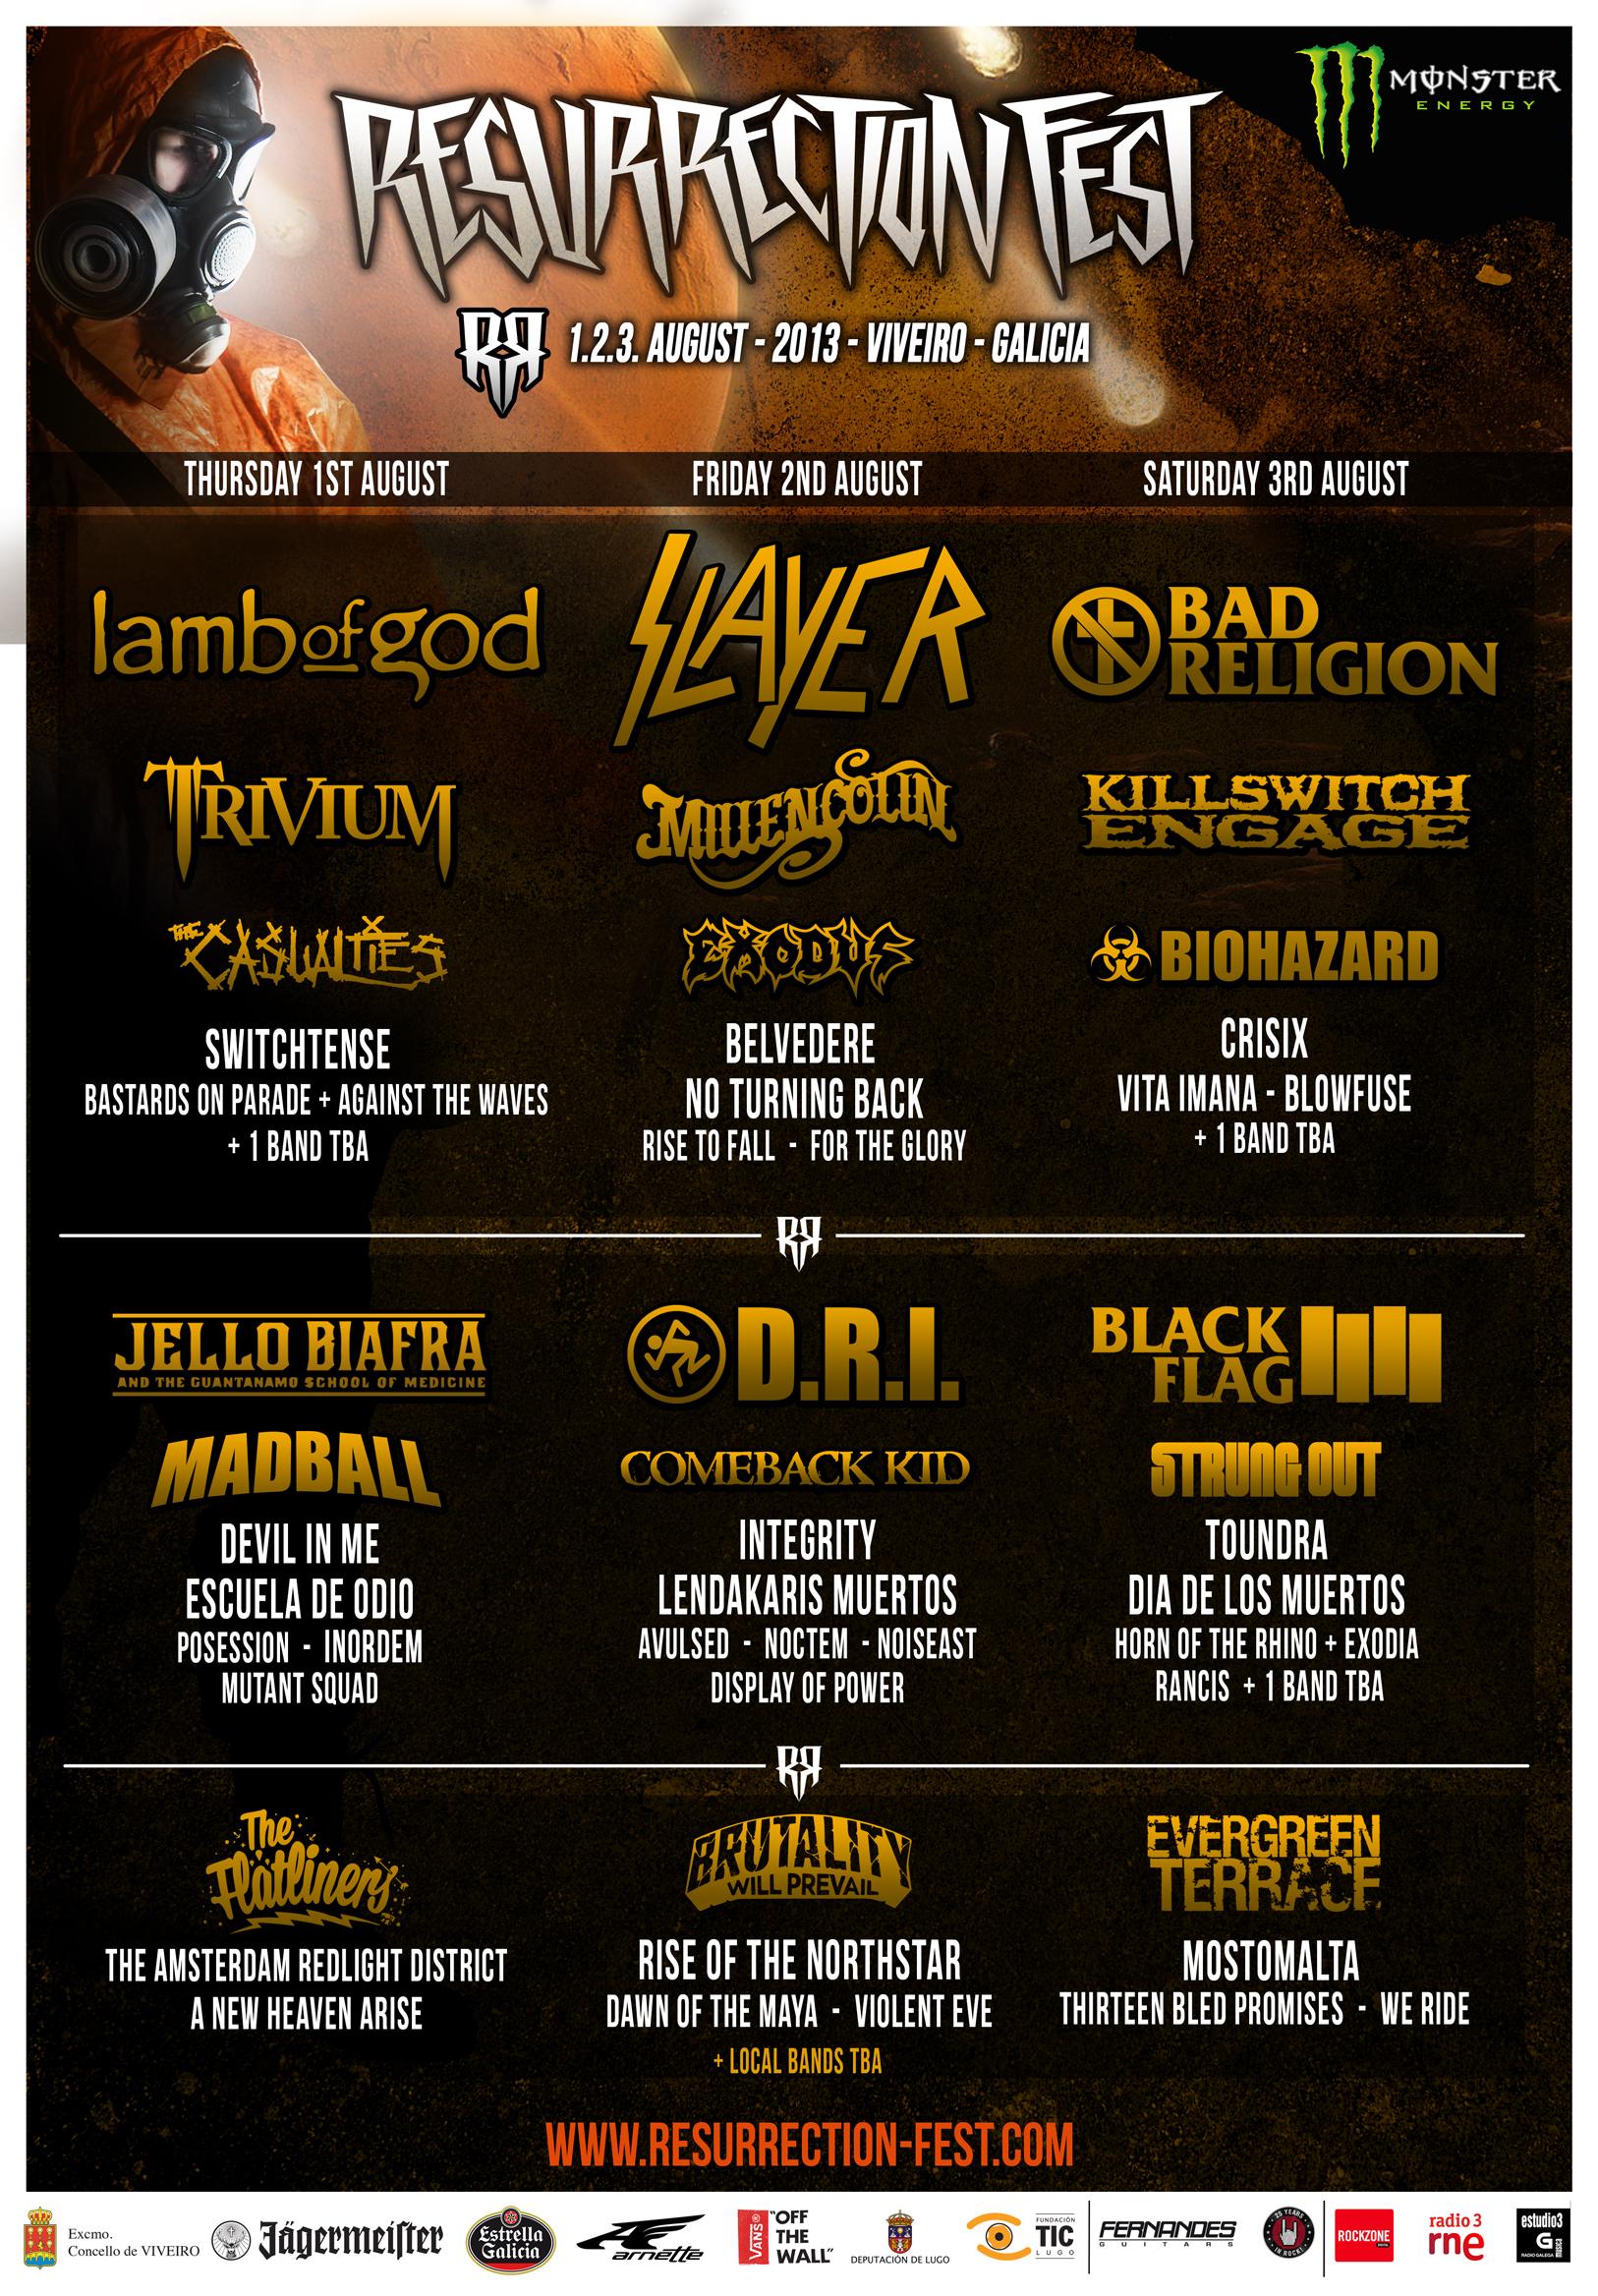 Resurrection Fest 2013 - Days